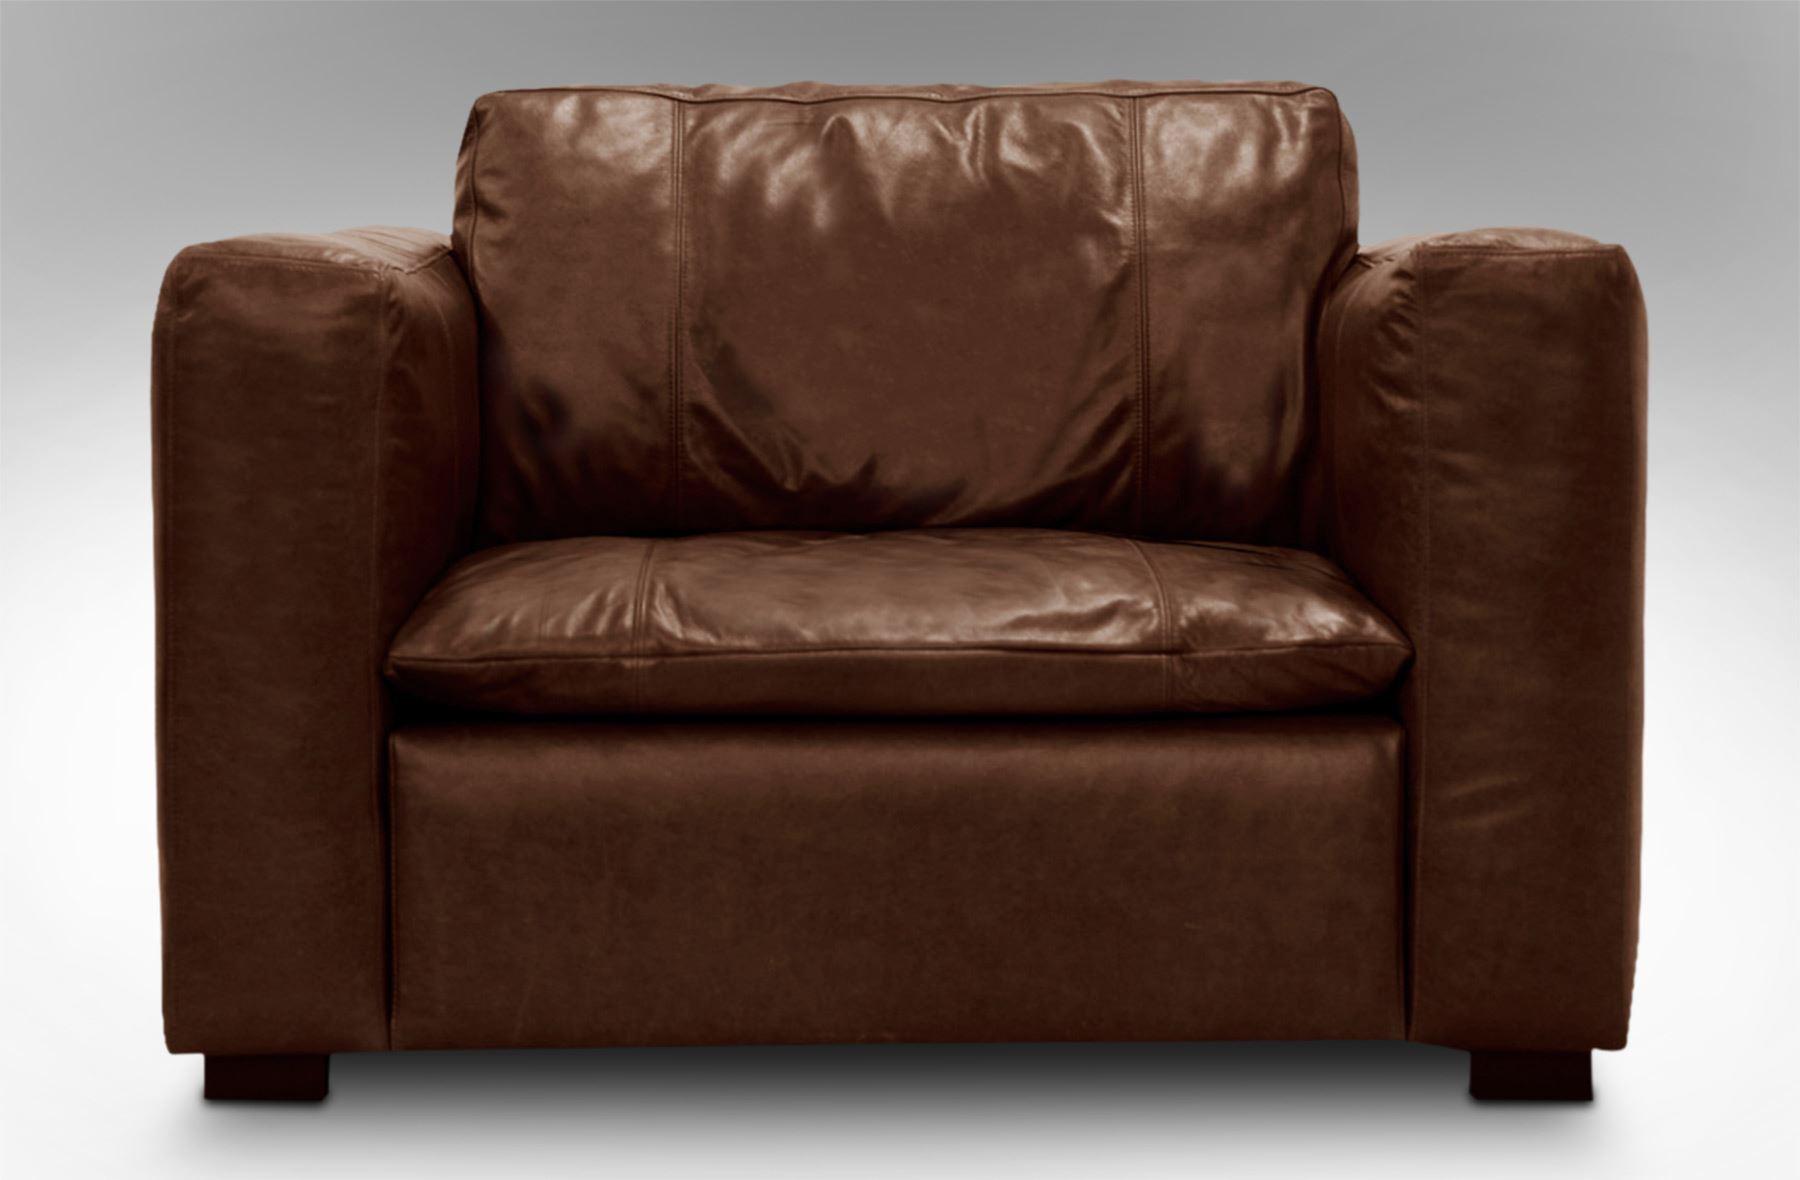 Rice Furniture Monash Single Leather Armchair Chestnut